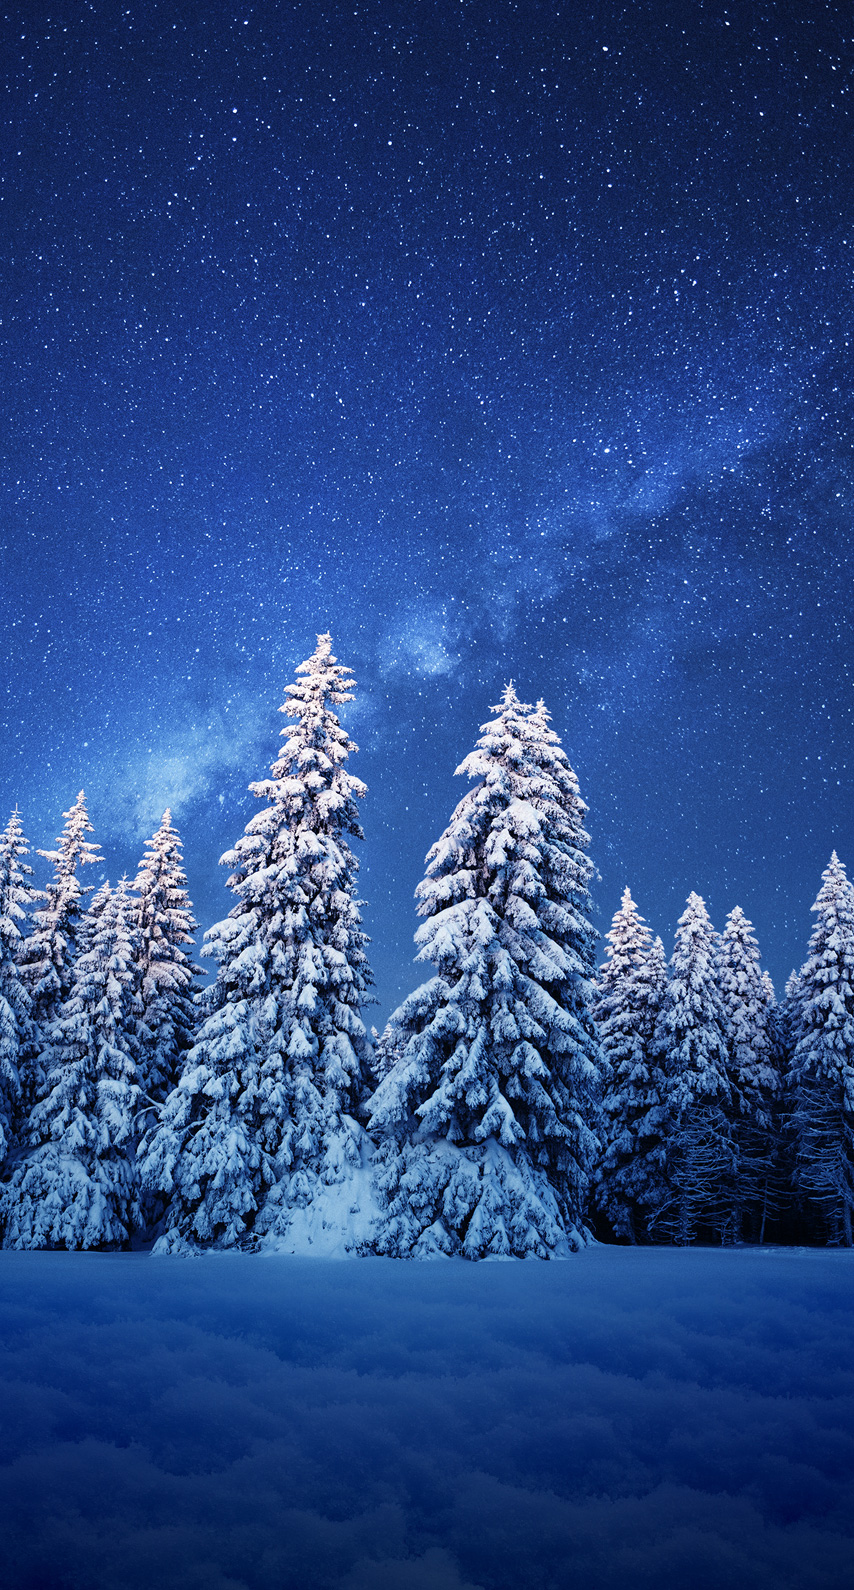 conifer, pine